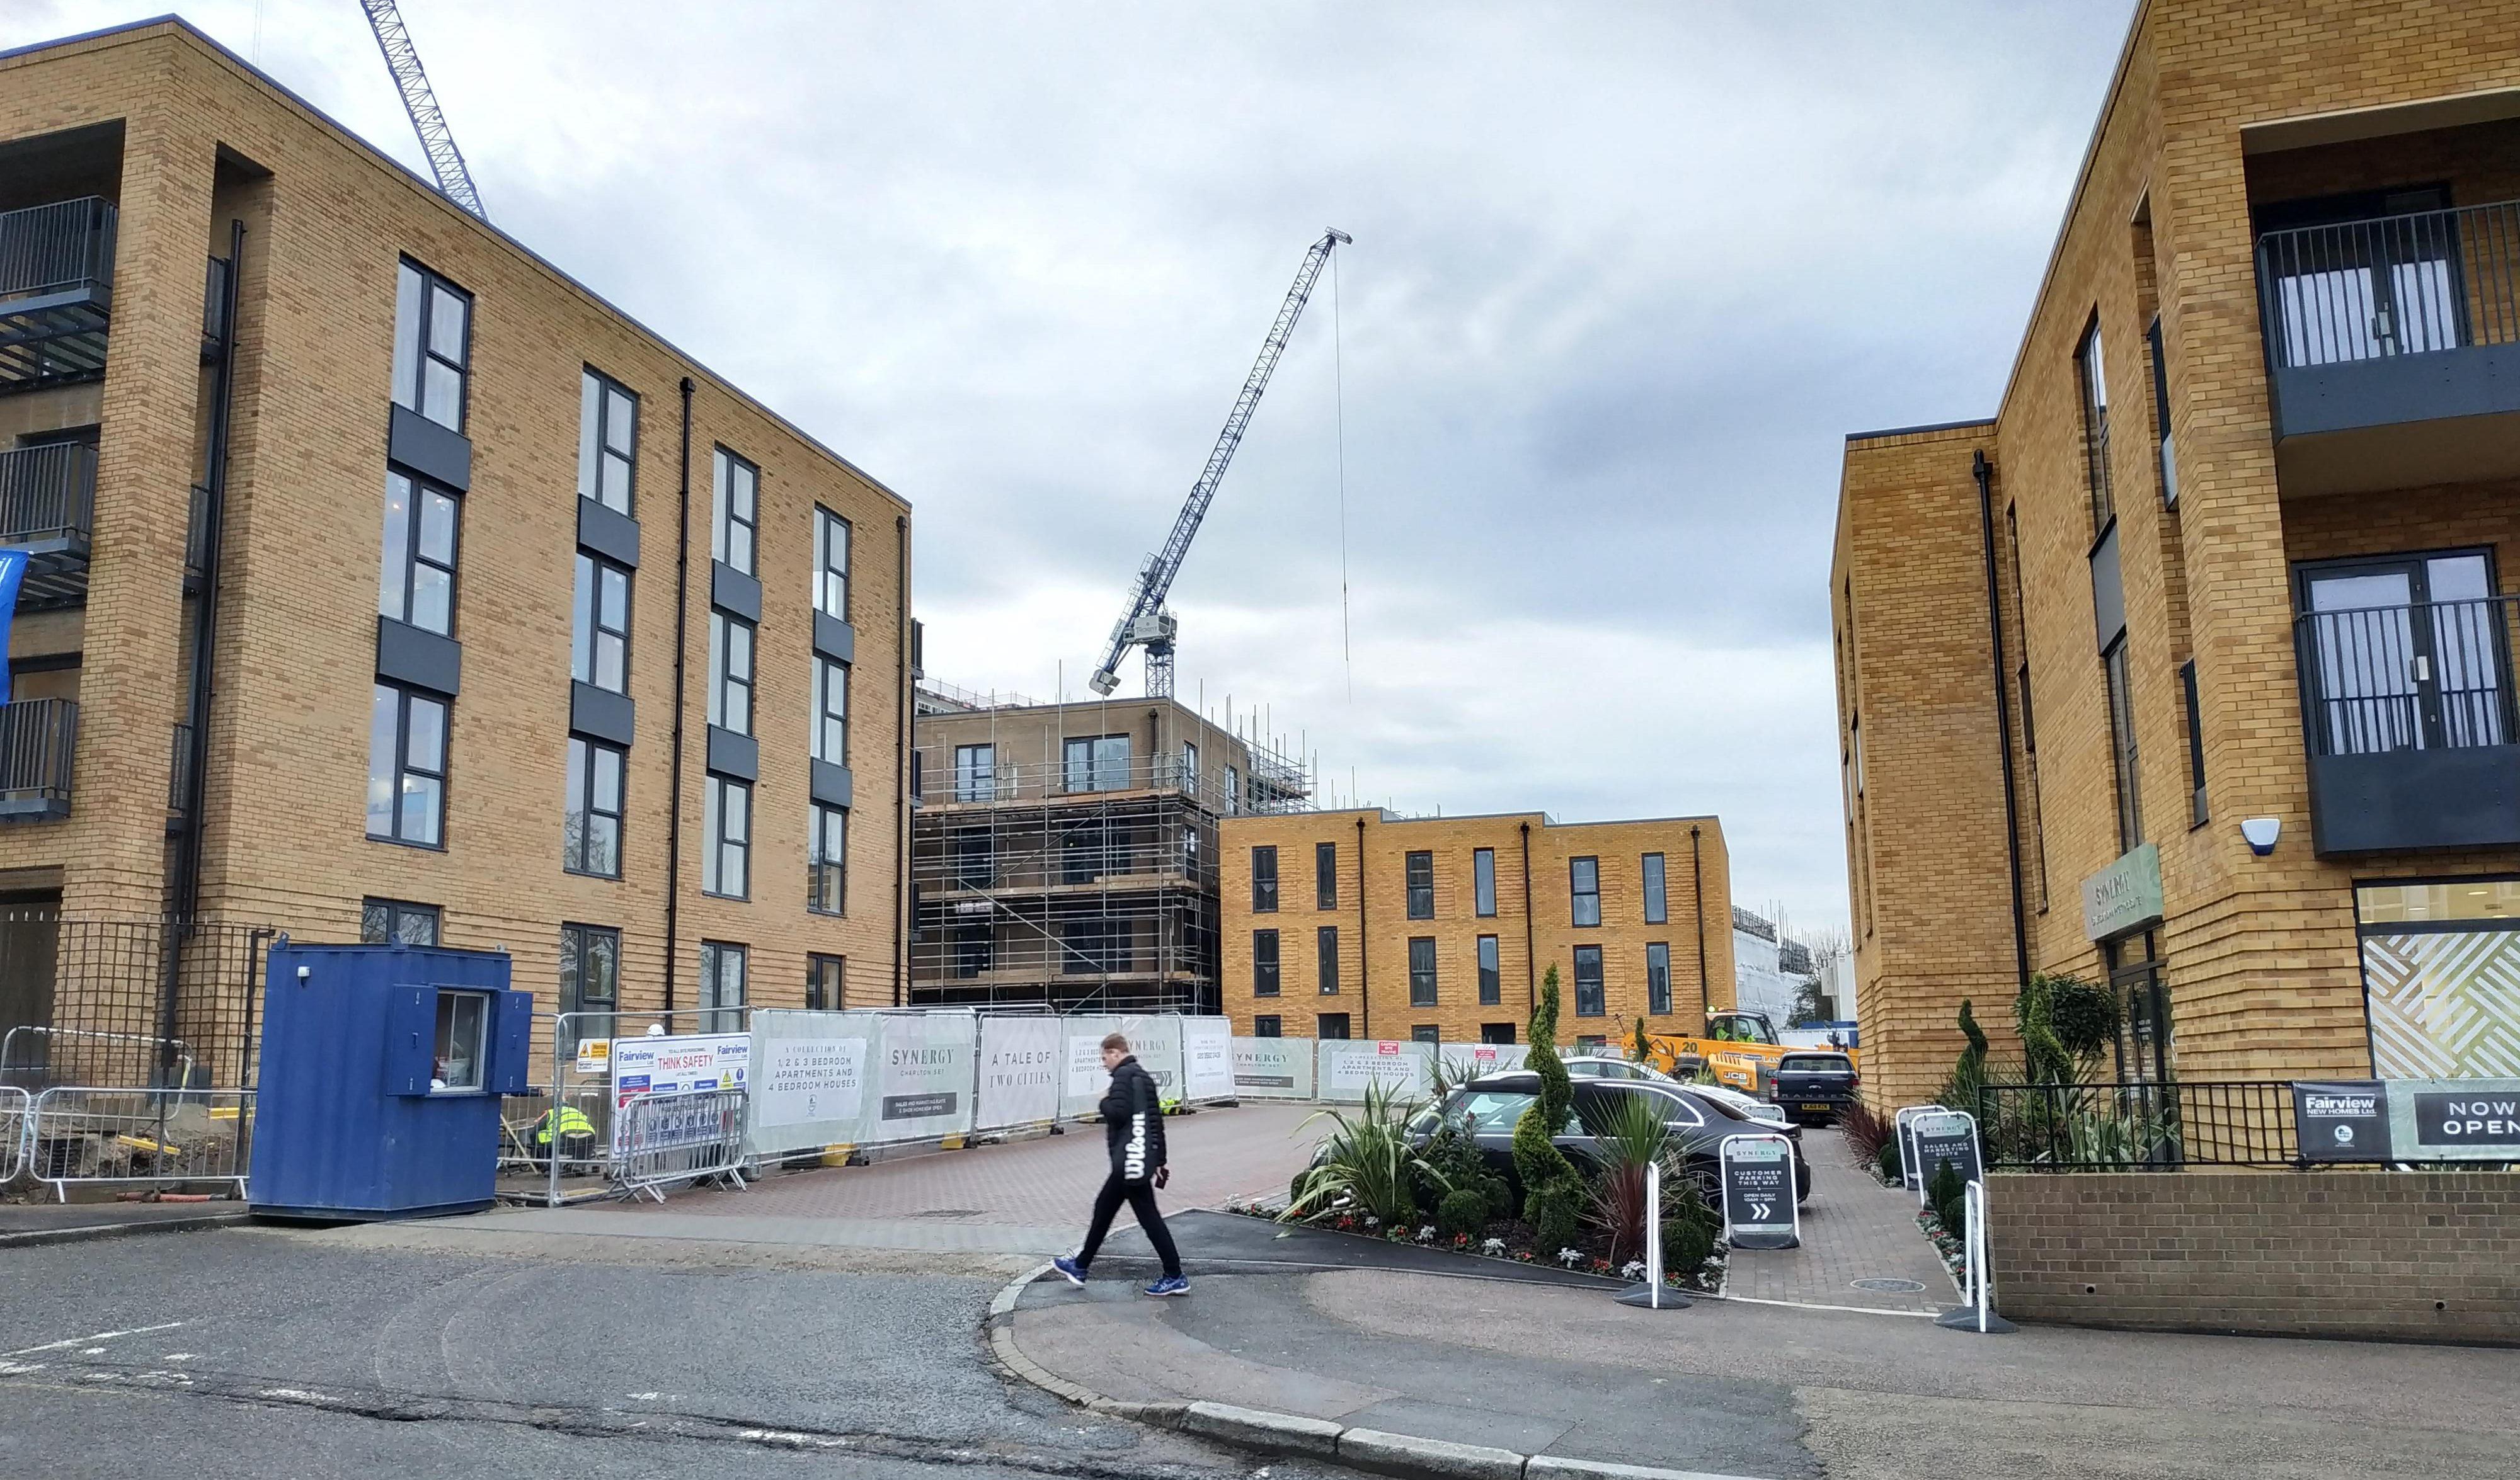 A look at 330 new homes at Victoria Way in Charlton